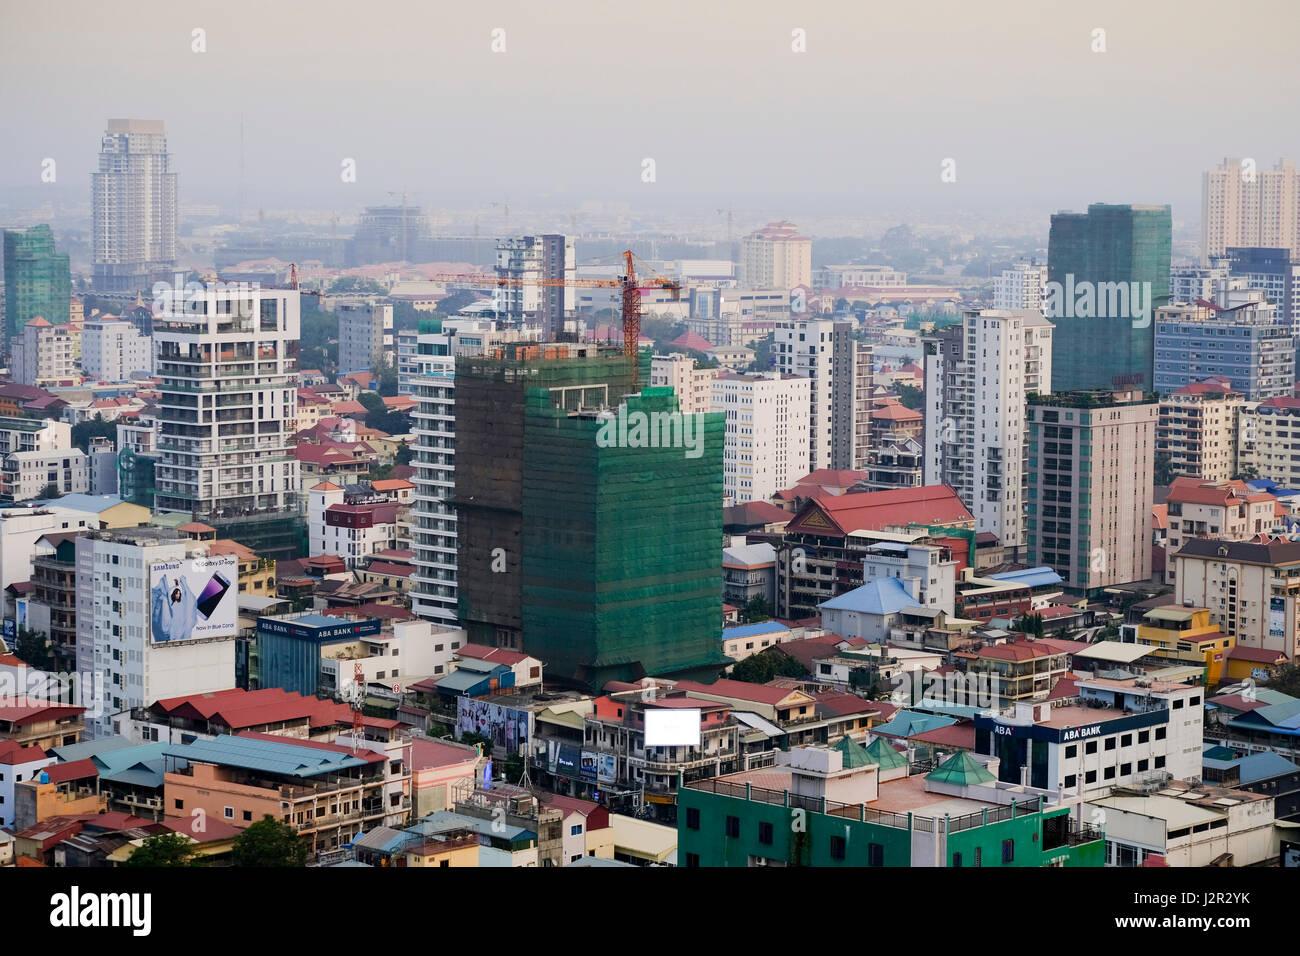 Phnom Penh city centre and skyline - Cambodia's capital city - Stock Image